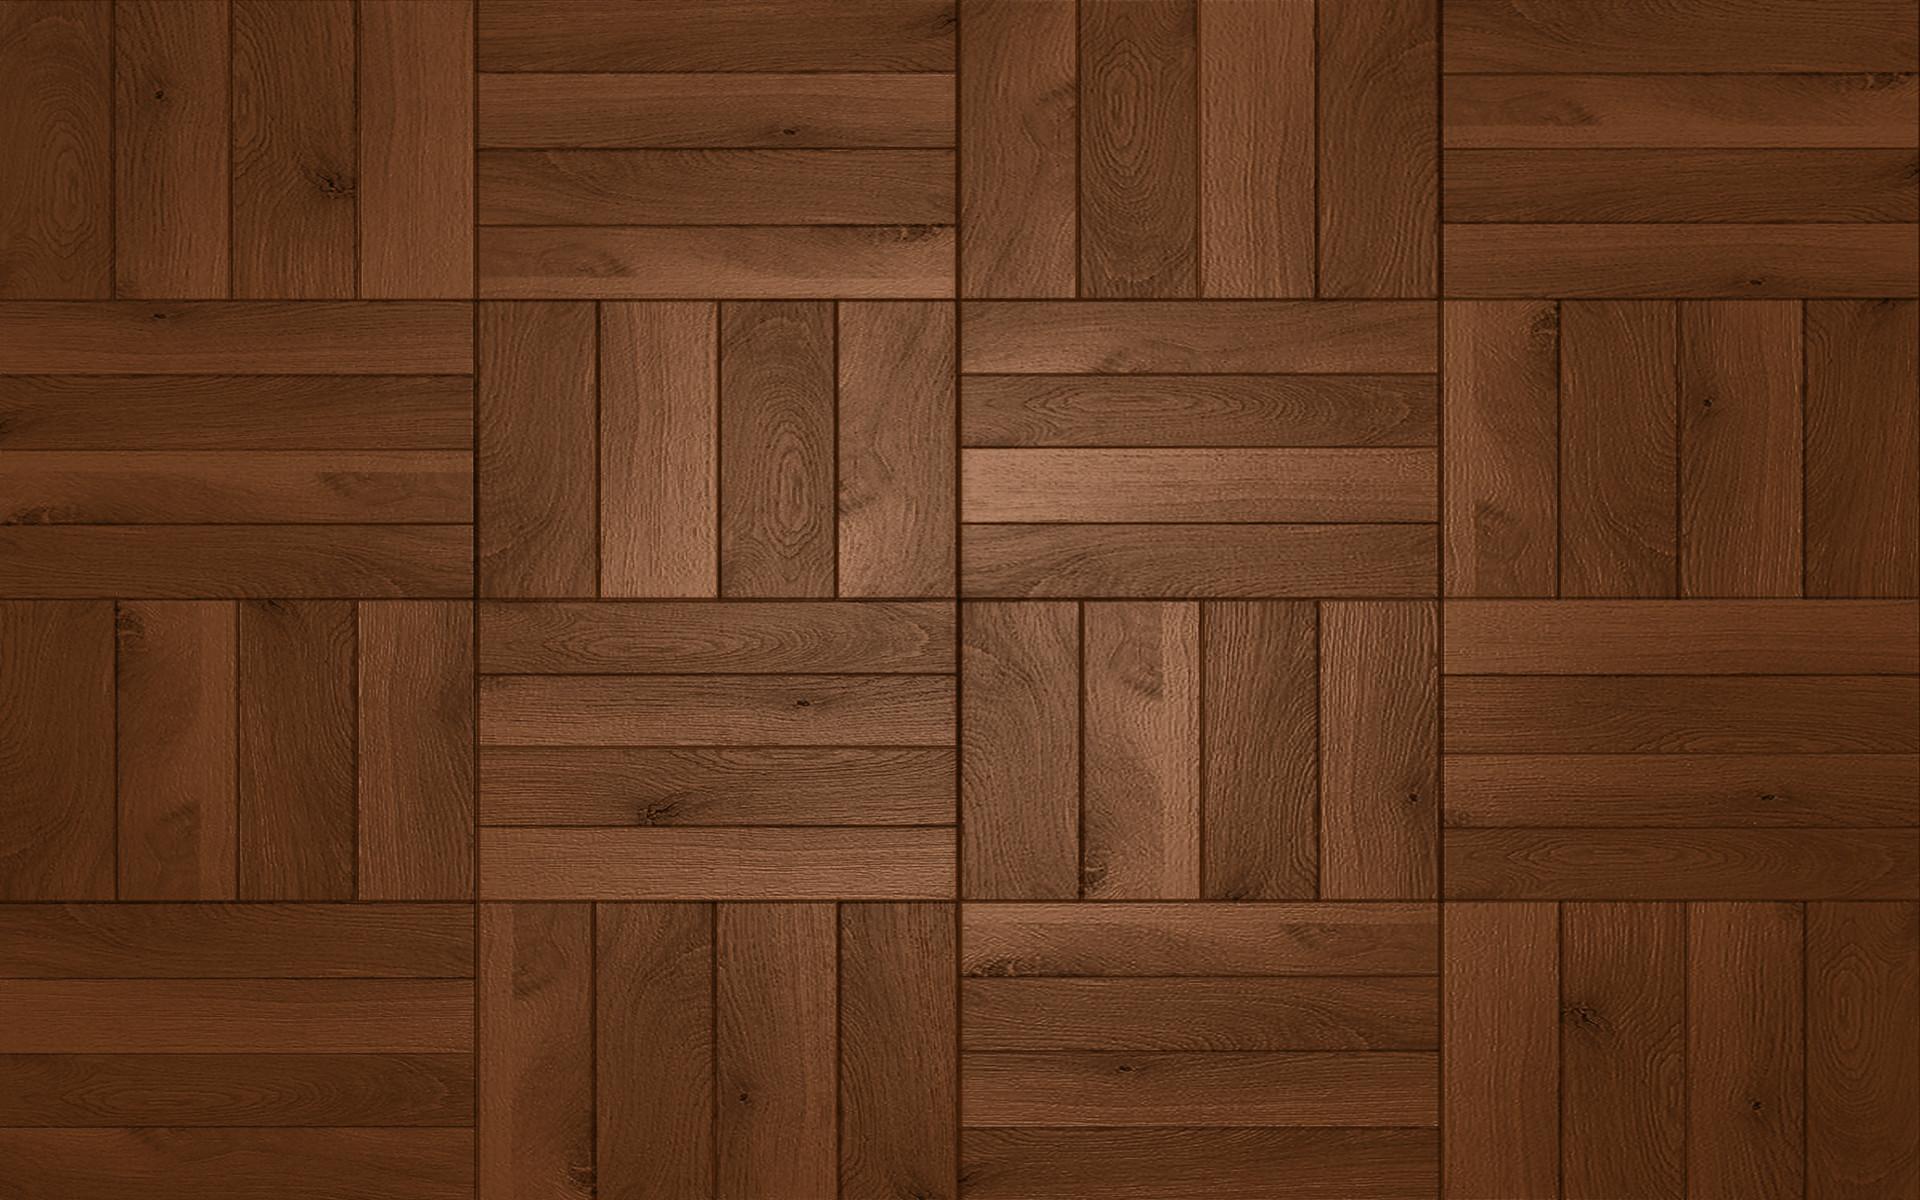 Pattern – Wood Floor Wallpaper